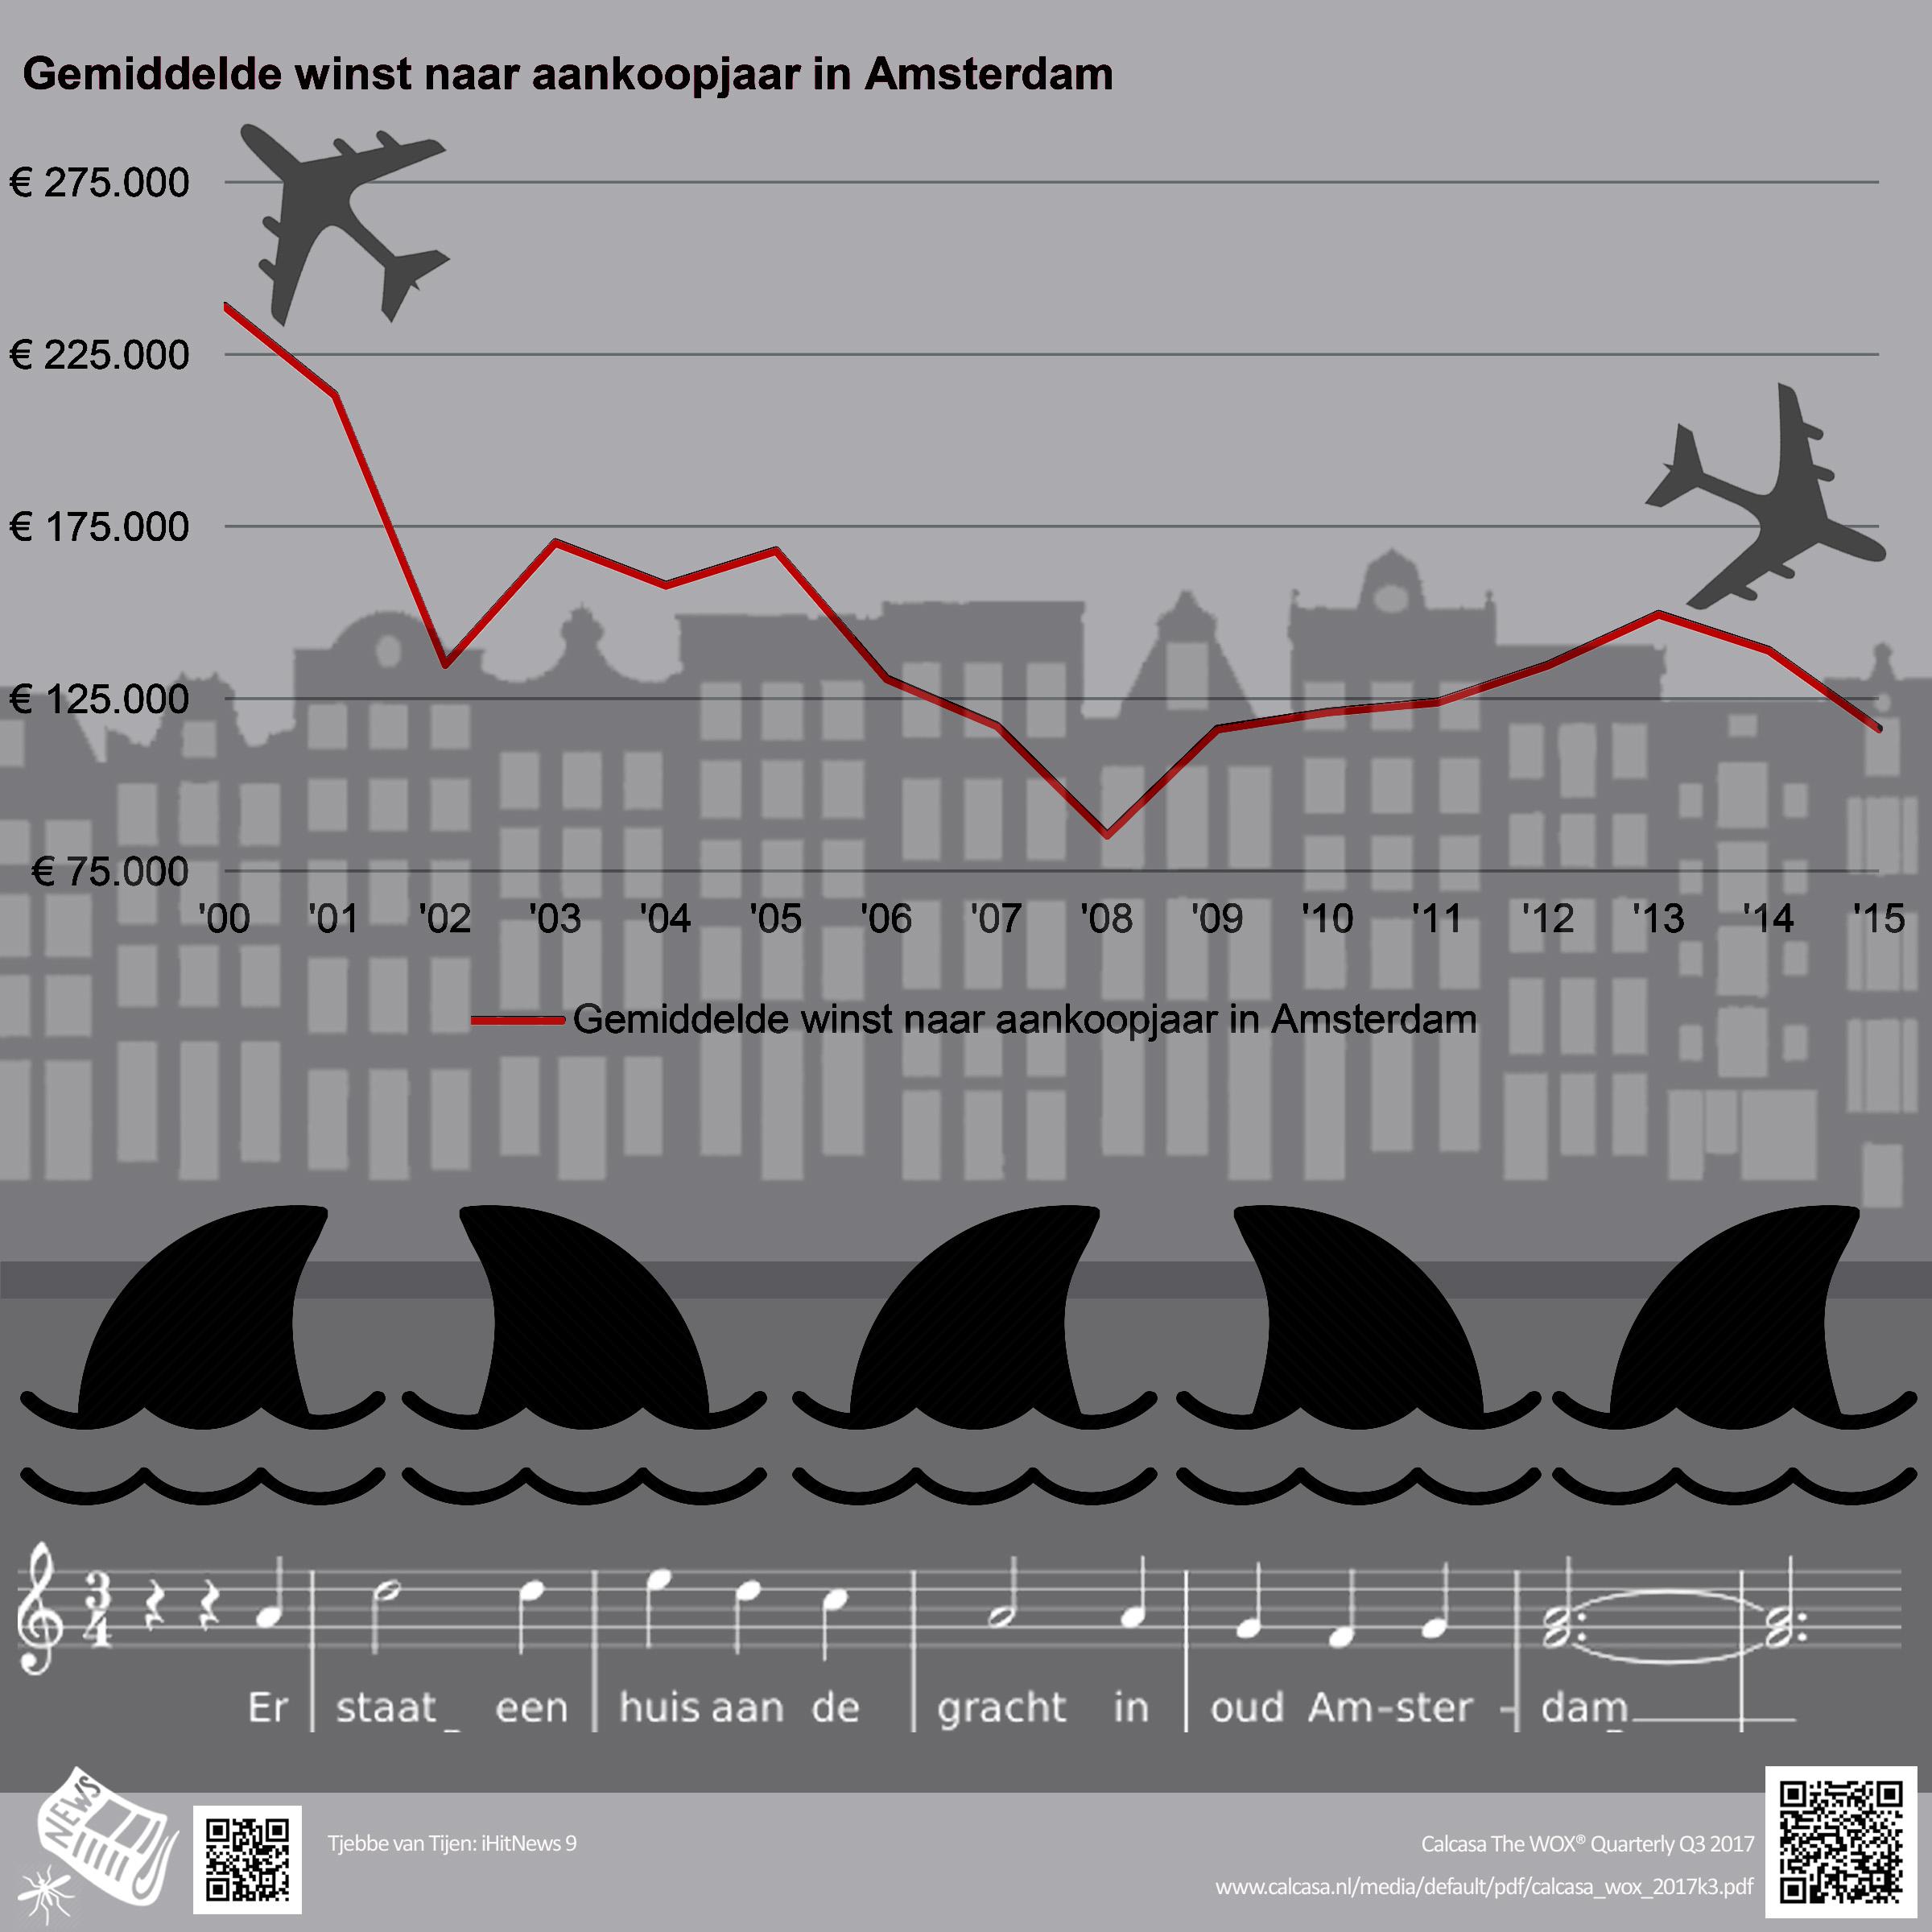 GehaaidAmsterdam_Speculatie2